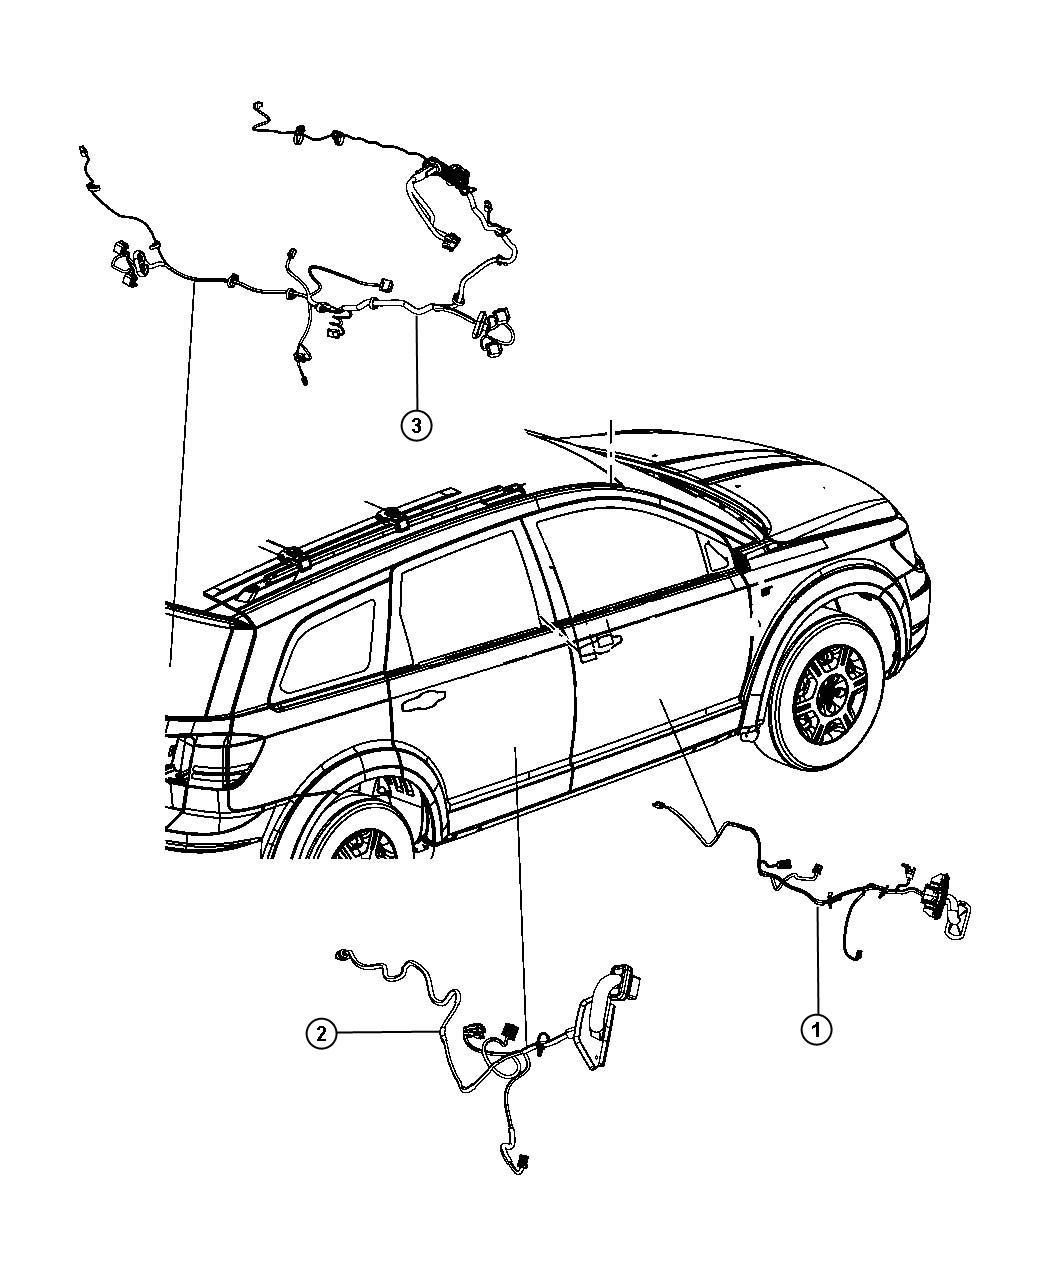 2013 Dodge Journey Wiring. Liftgate. [incandescent stop